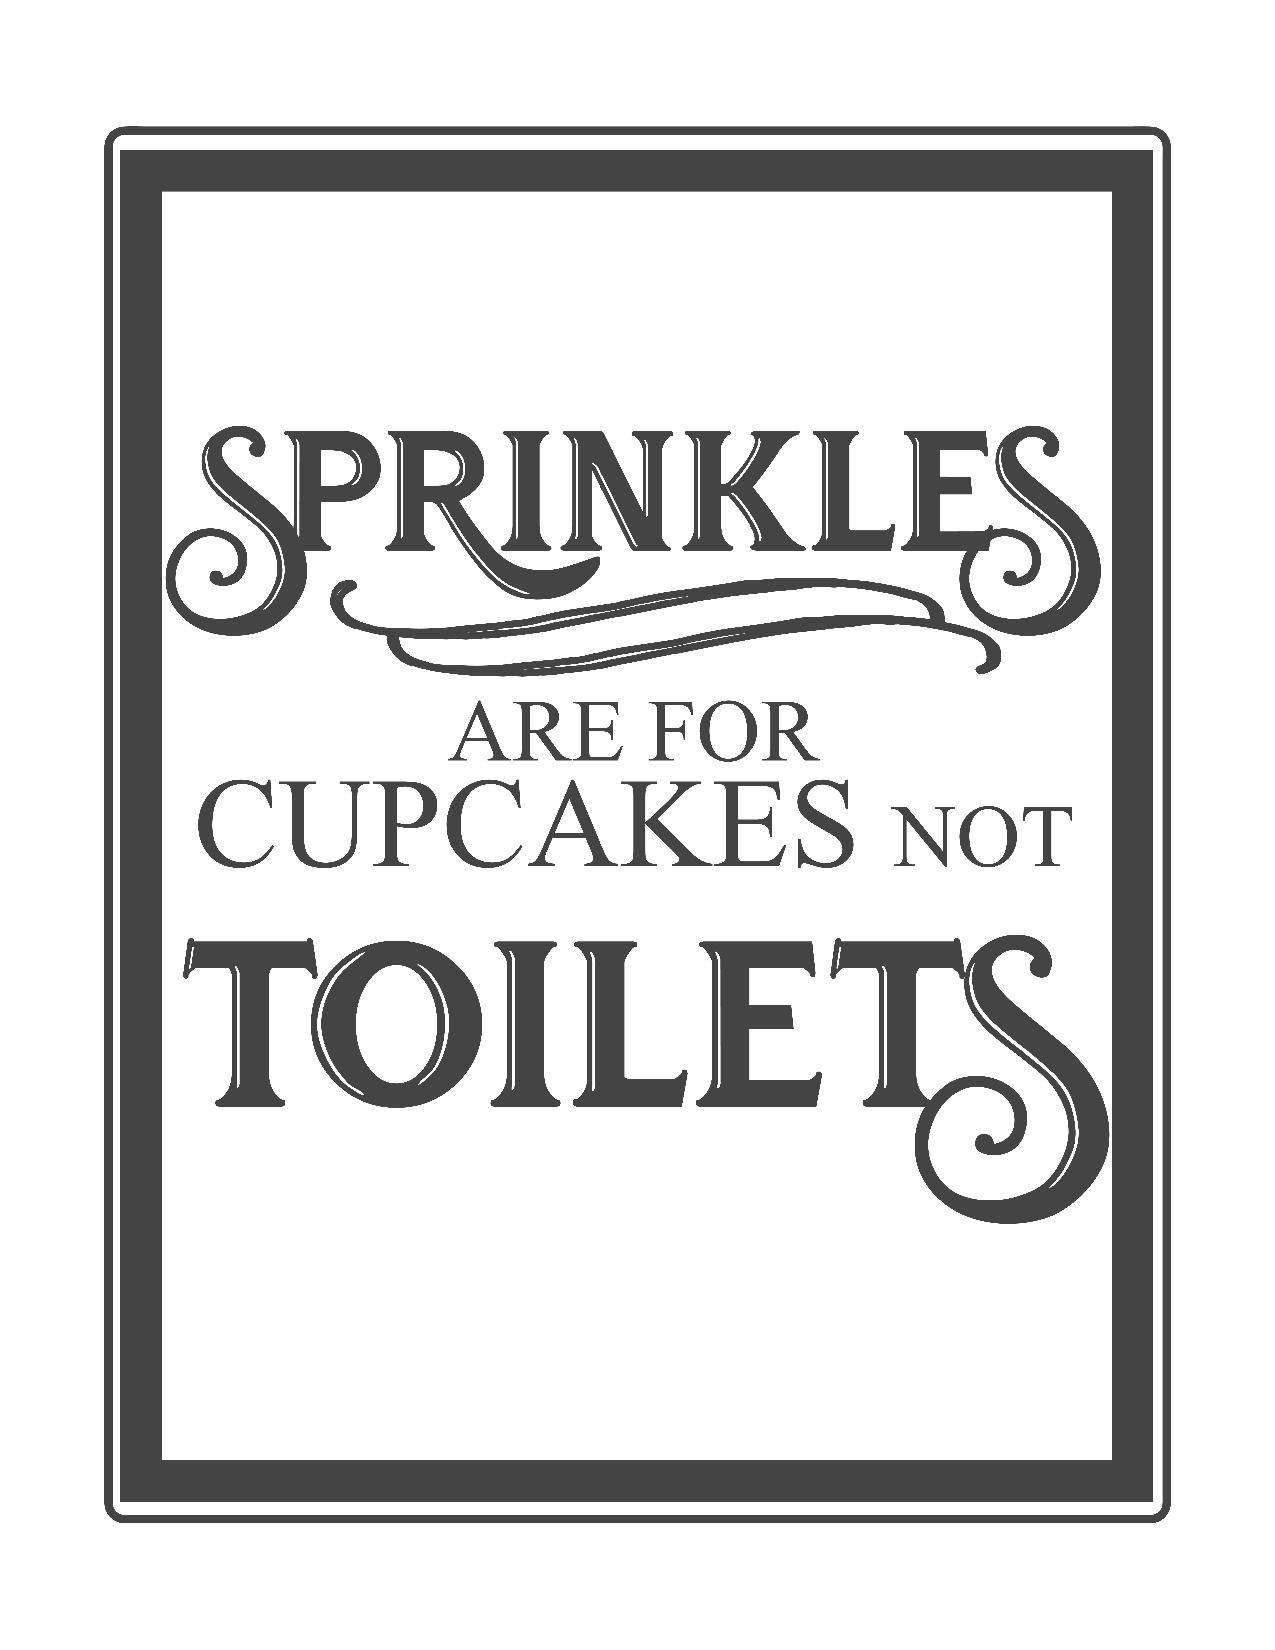 Free Vintage Bathroom Printables | Printables ** | Pinterest - Free Printable Flush The Toilet Signs